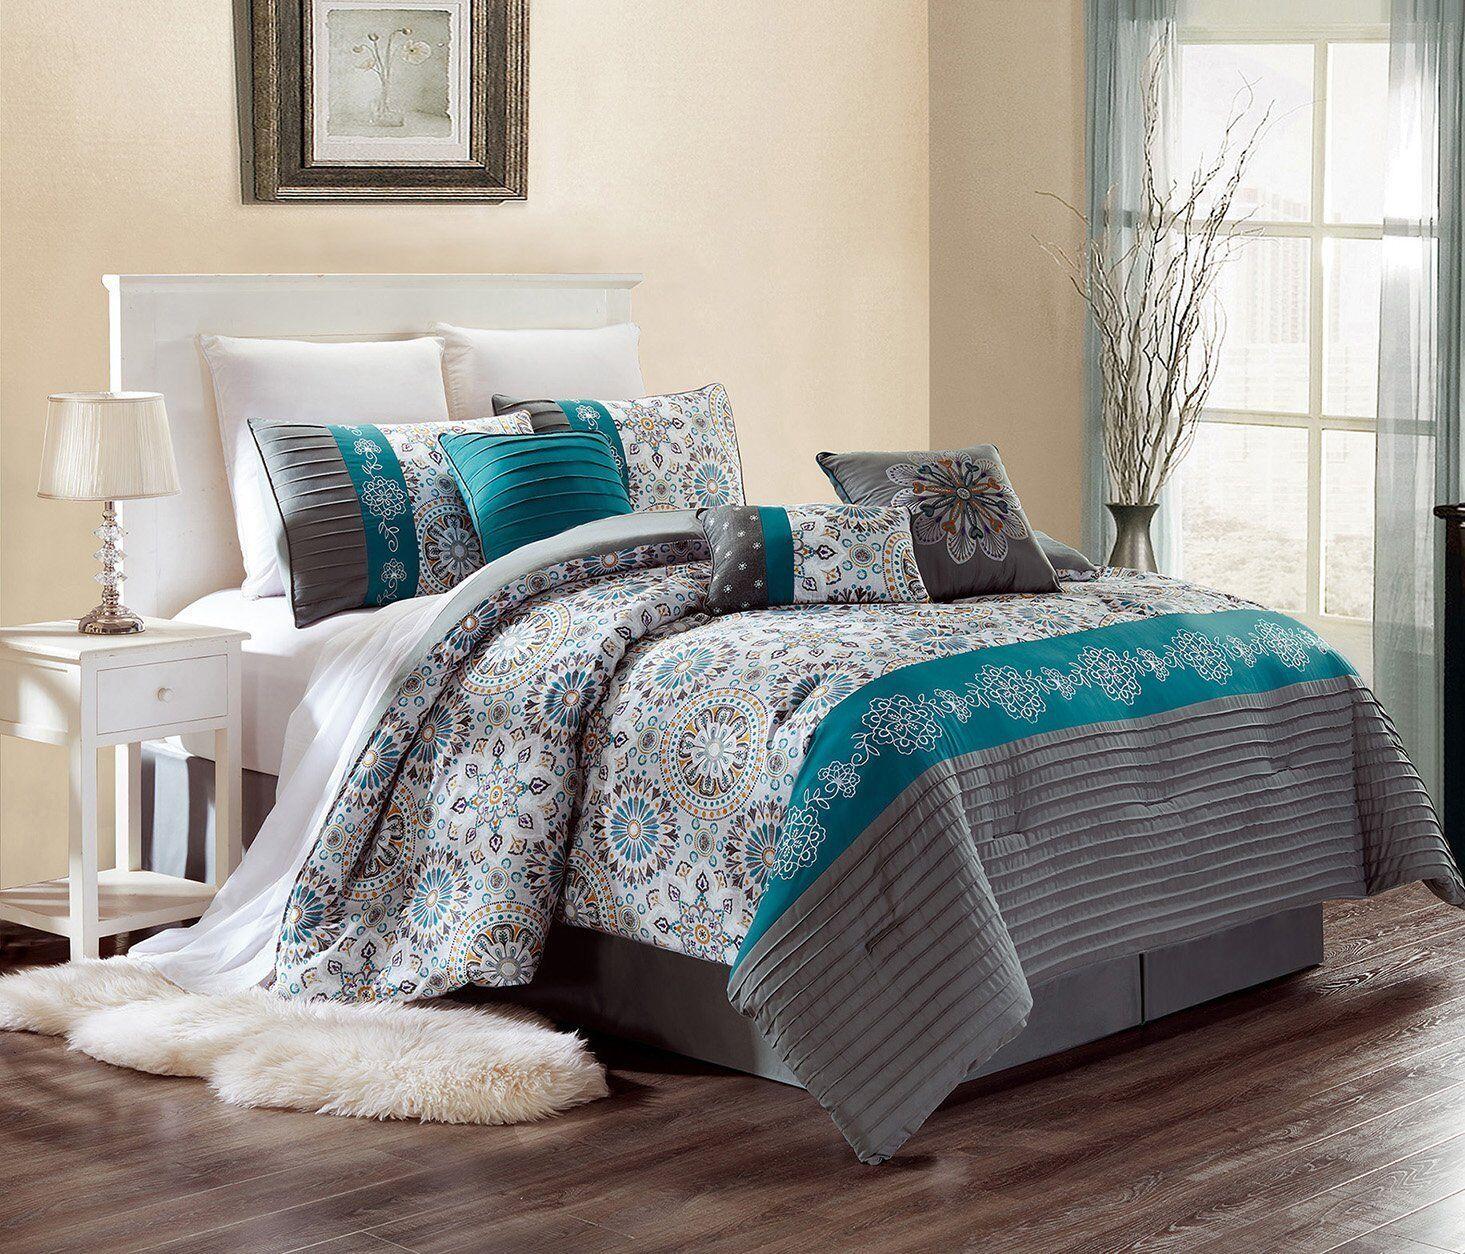 Luxury 7 Pc Pin Tuck Comforter Set  Dark Grey/Teal Blue/Yell